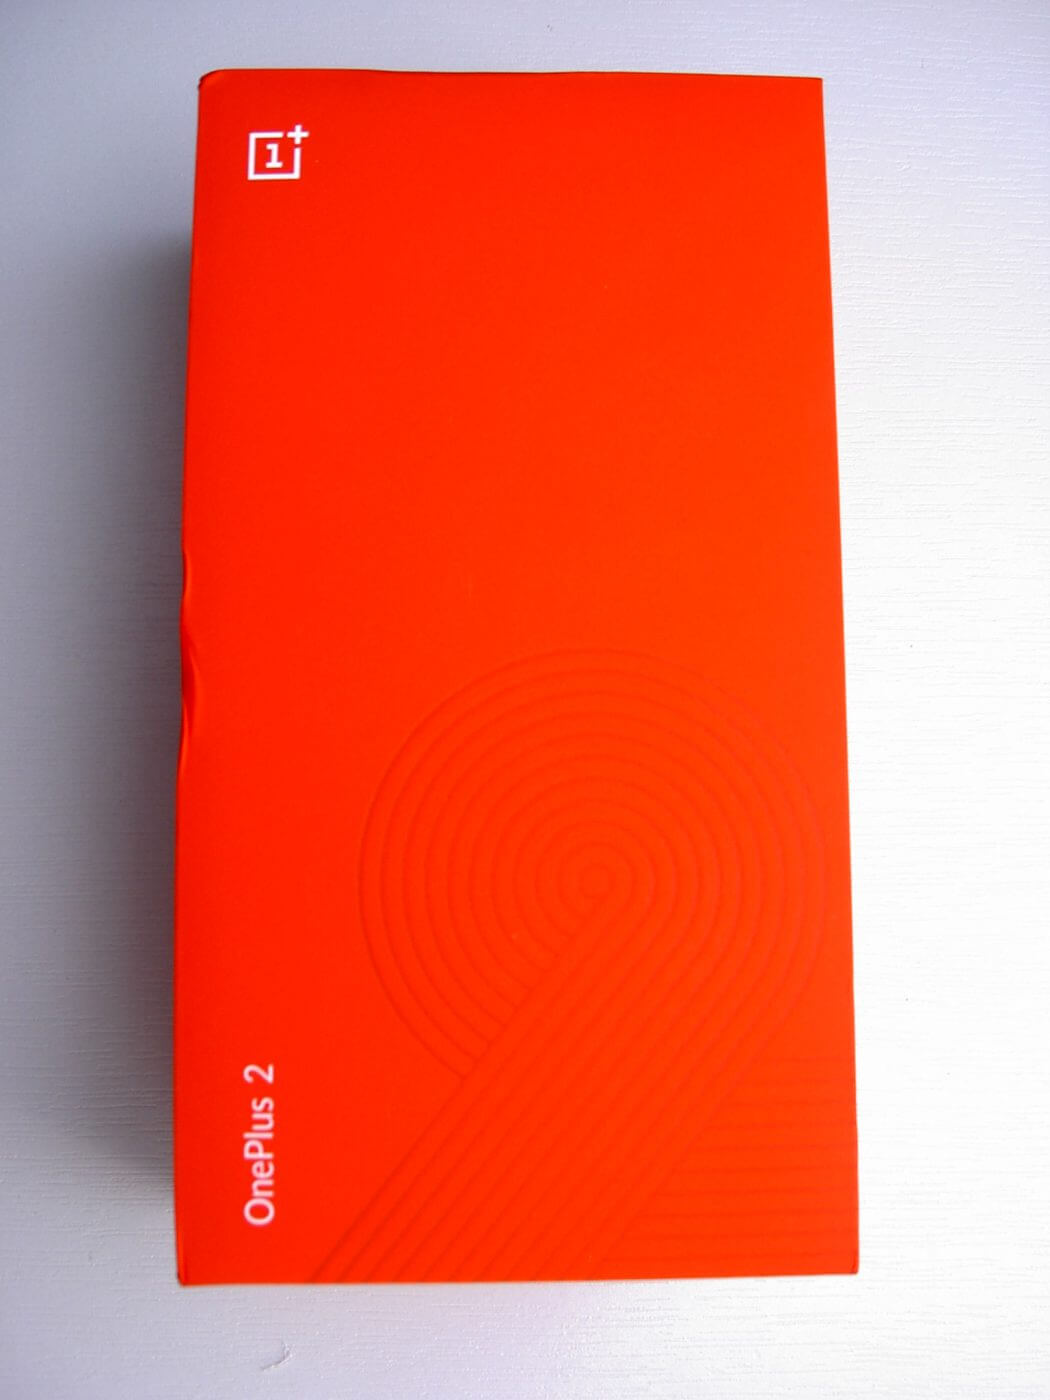 OnePlus 2 in box